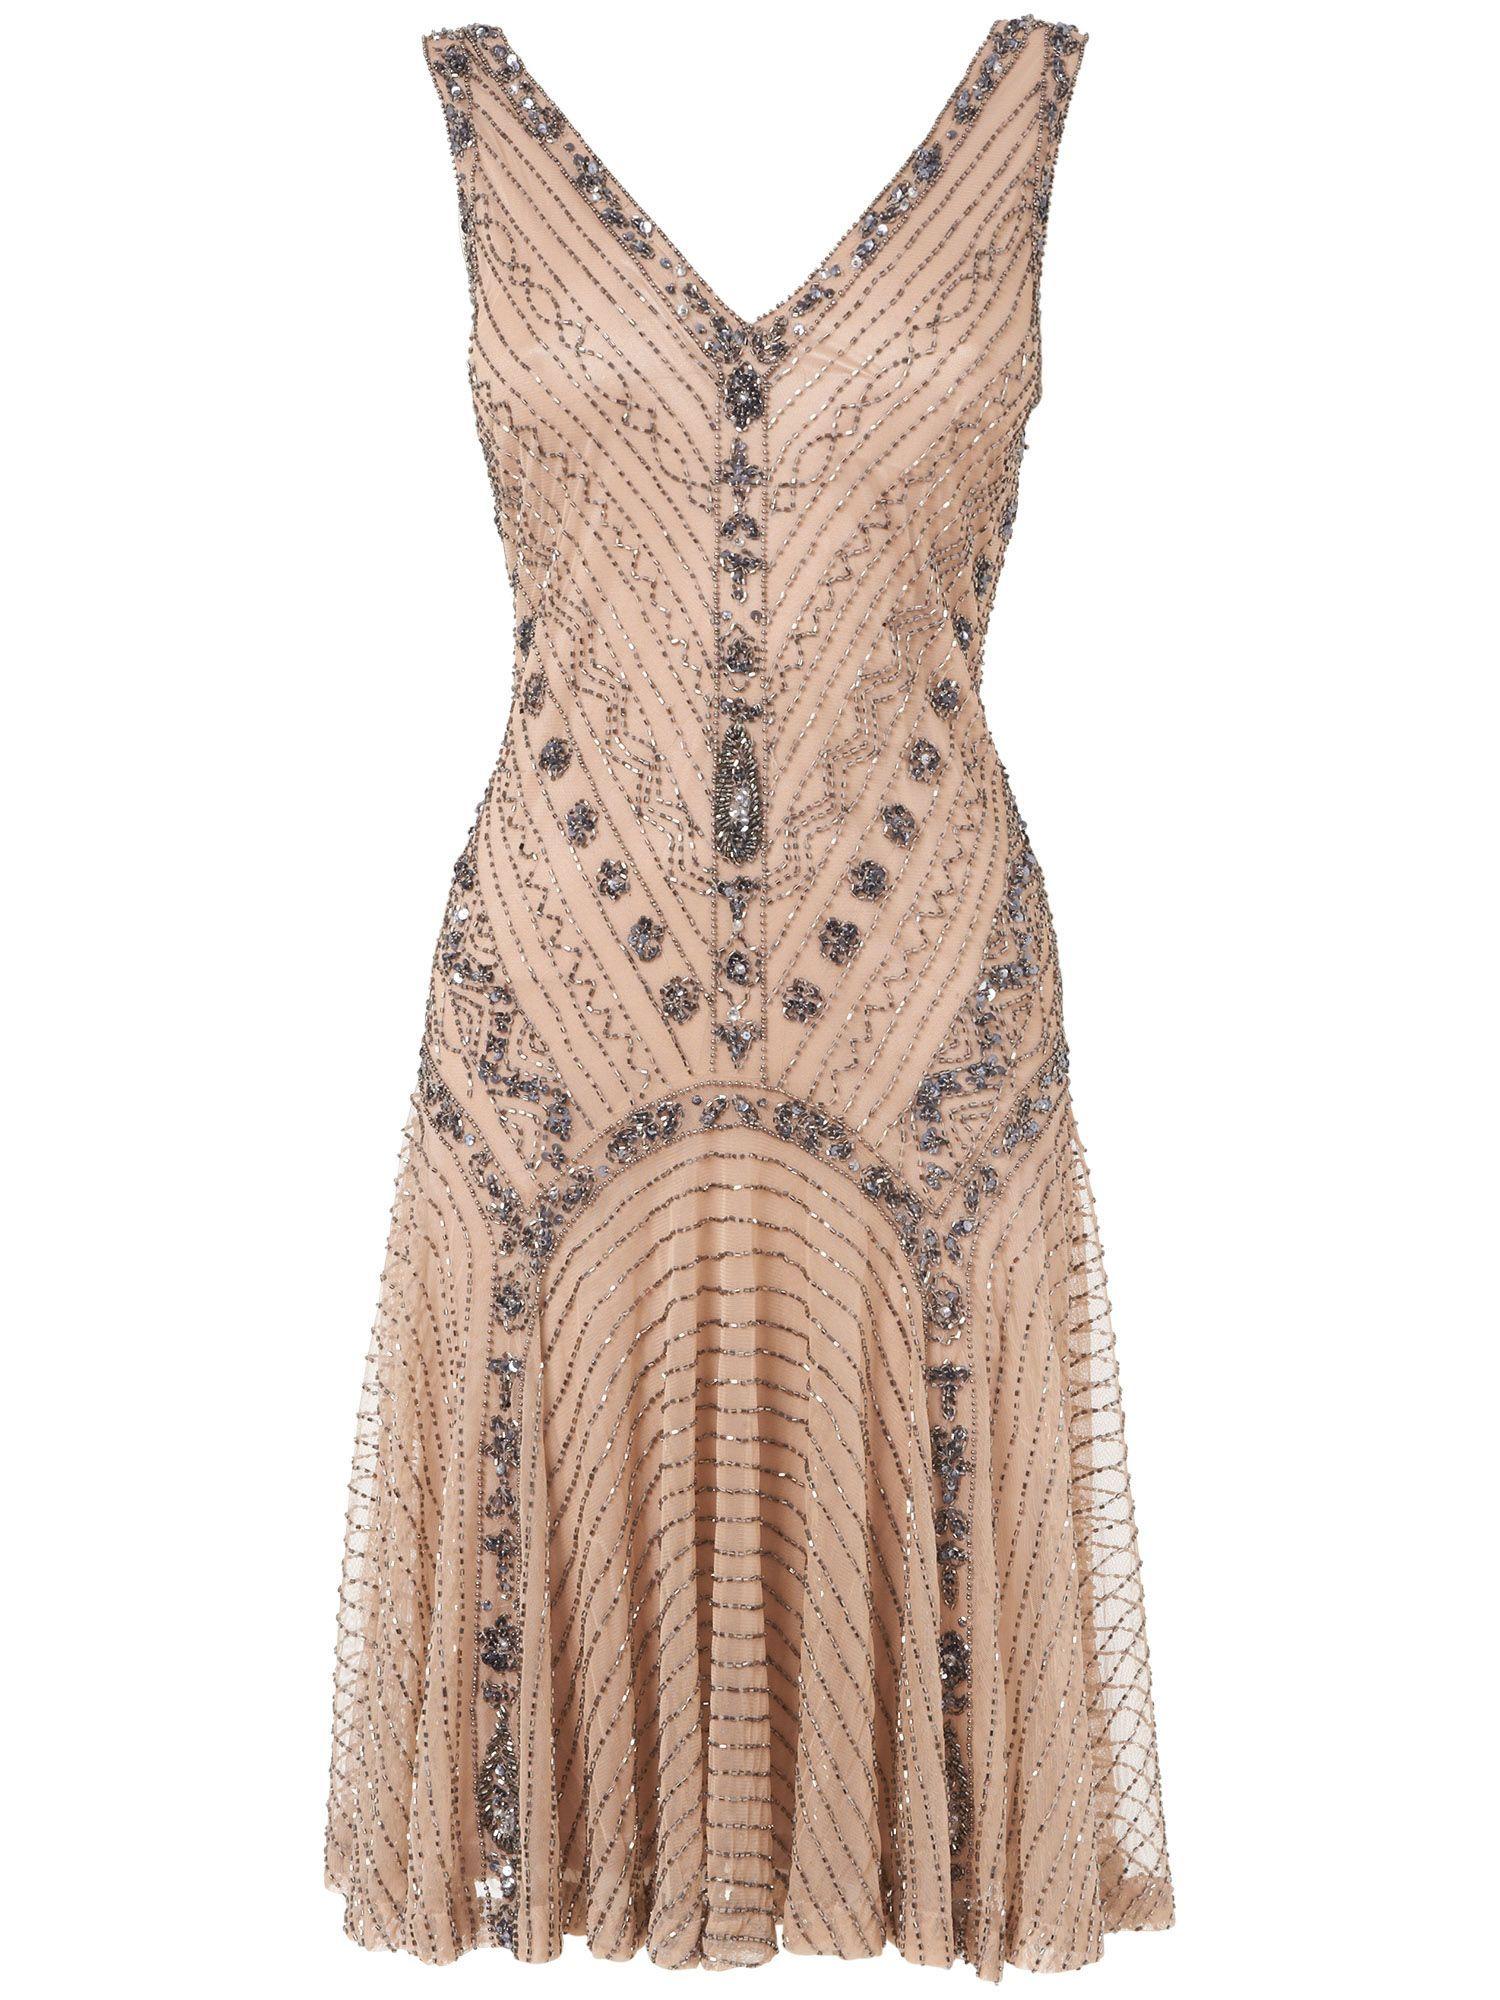 New Style 1920s Fler Dress Uk Phase Eight Gatsby Beaded 225 00